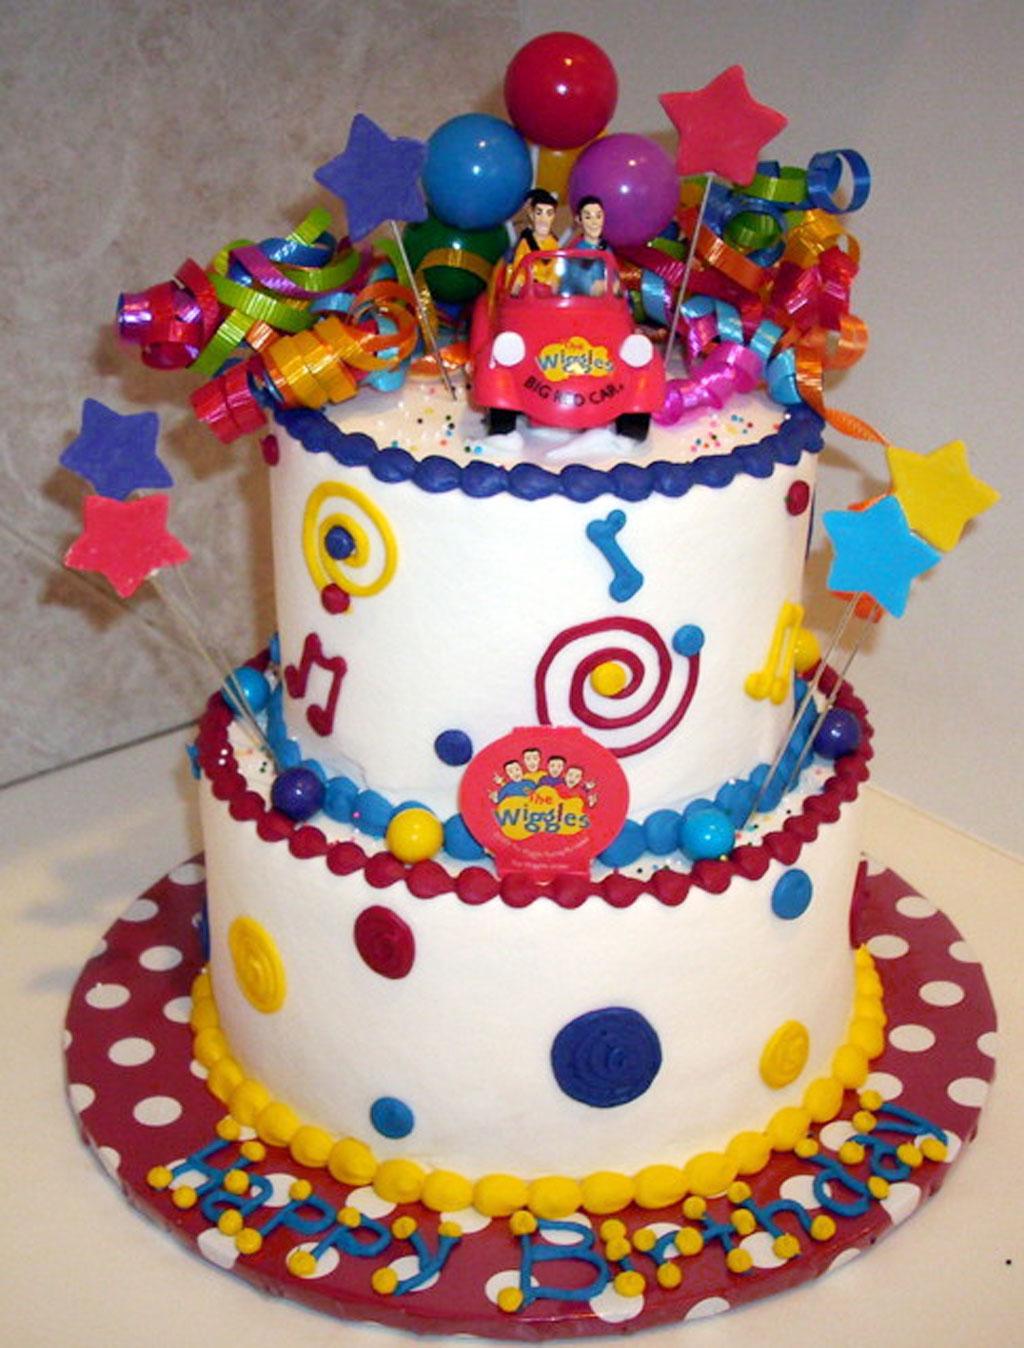 Wiggles Birthday Cake Decoration Birthday Cake - Cake ...